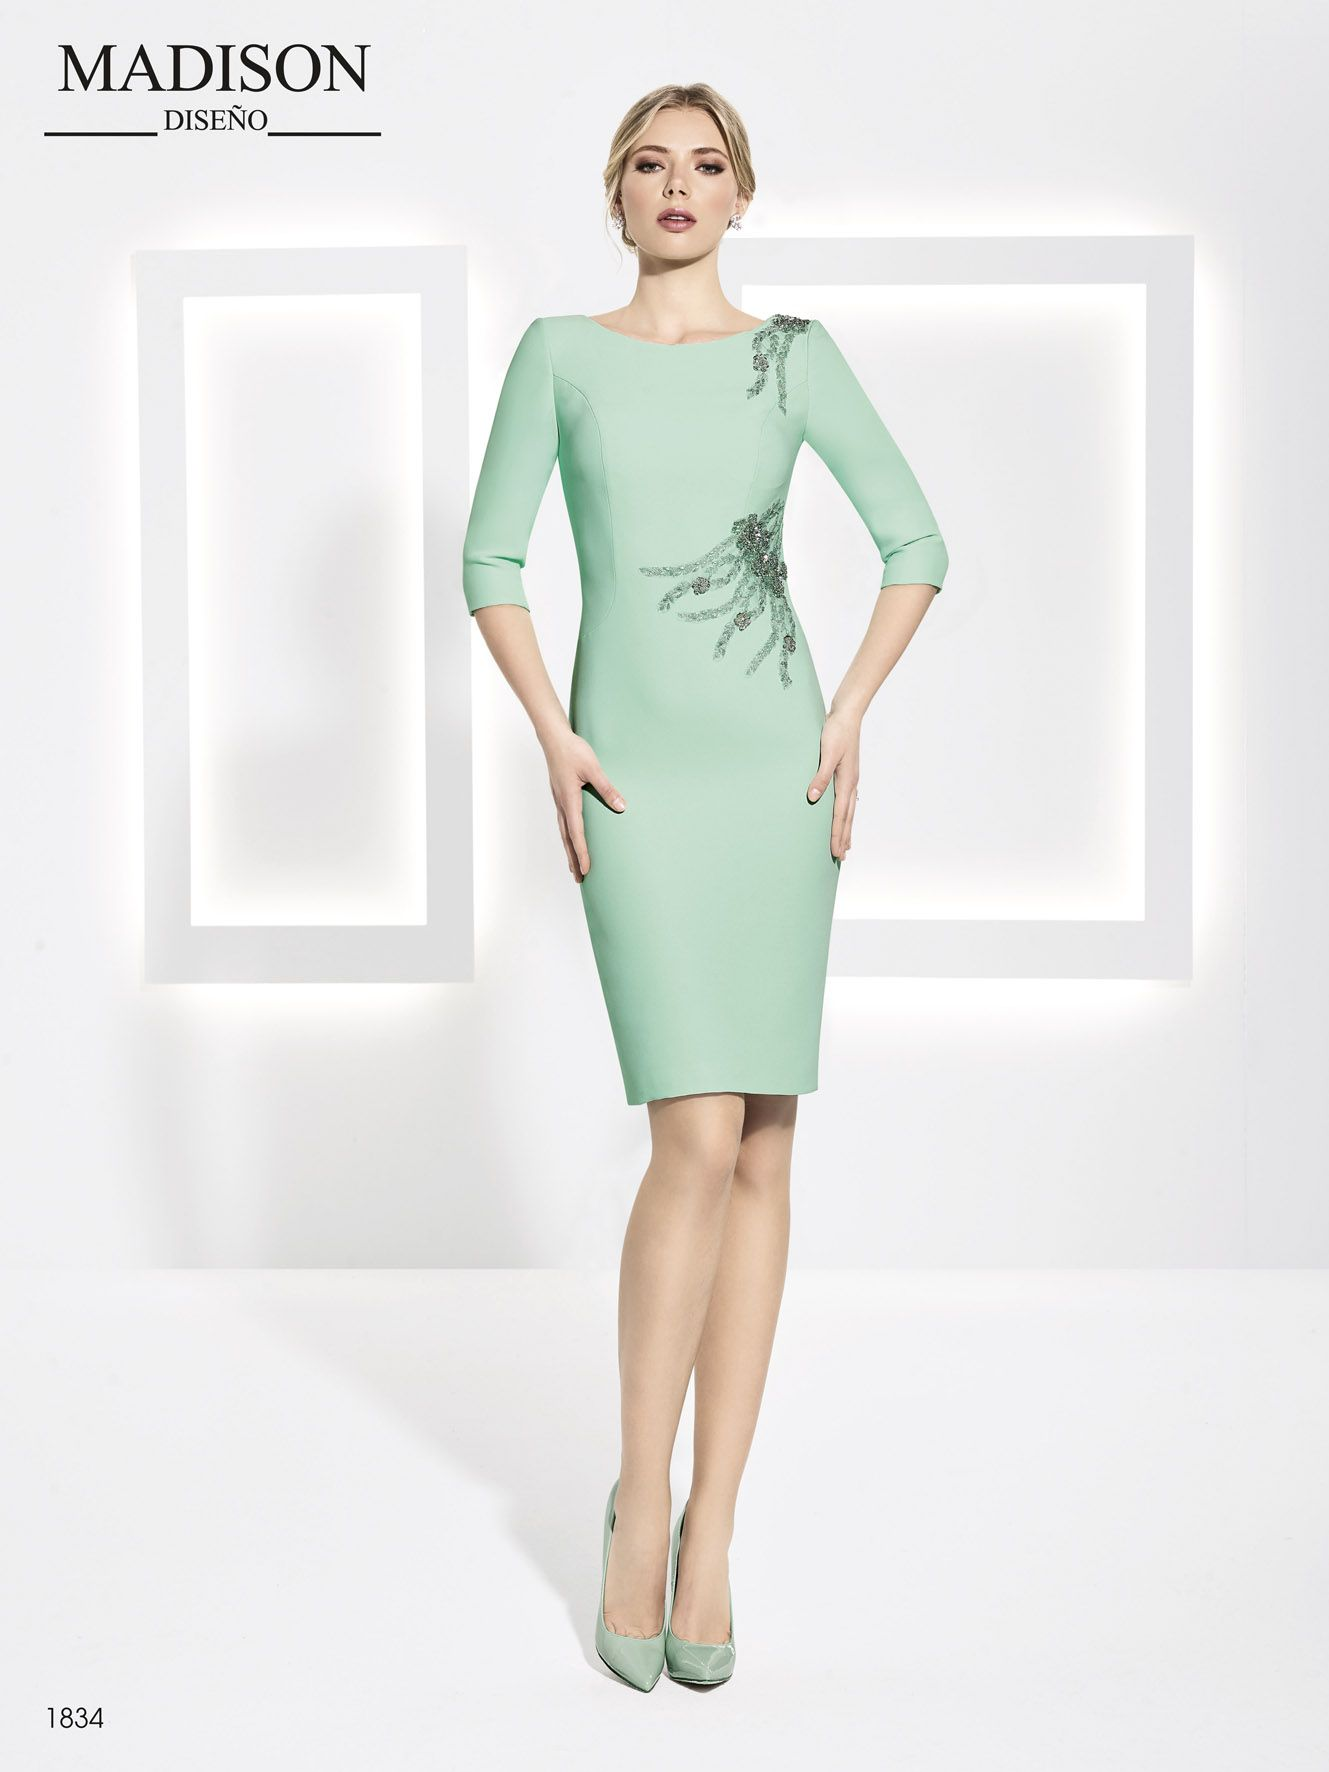 d5f31bcdbe vestido de fiesta color verde madison